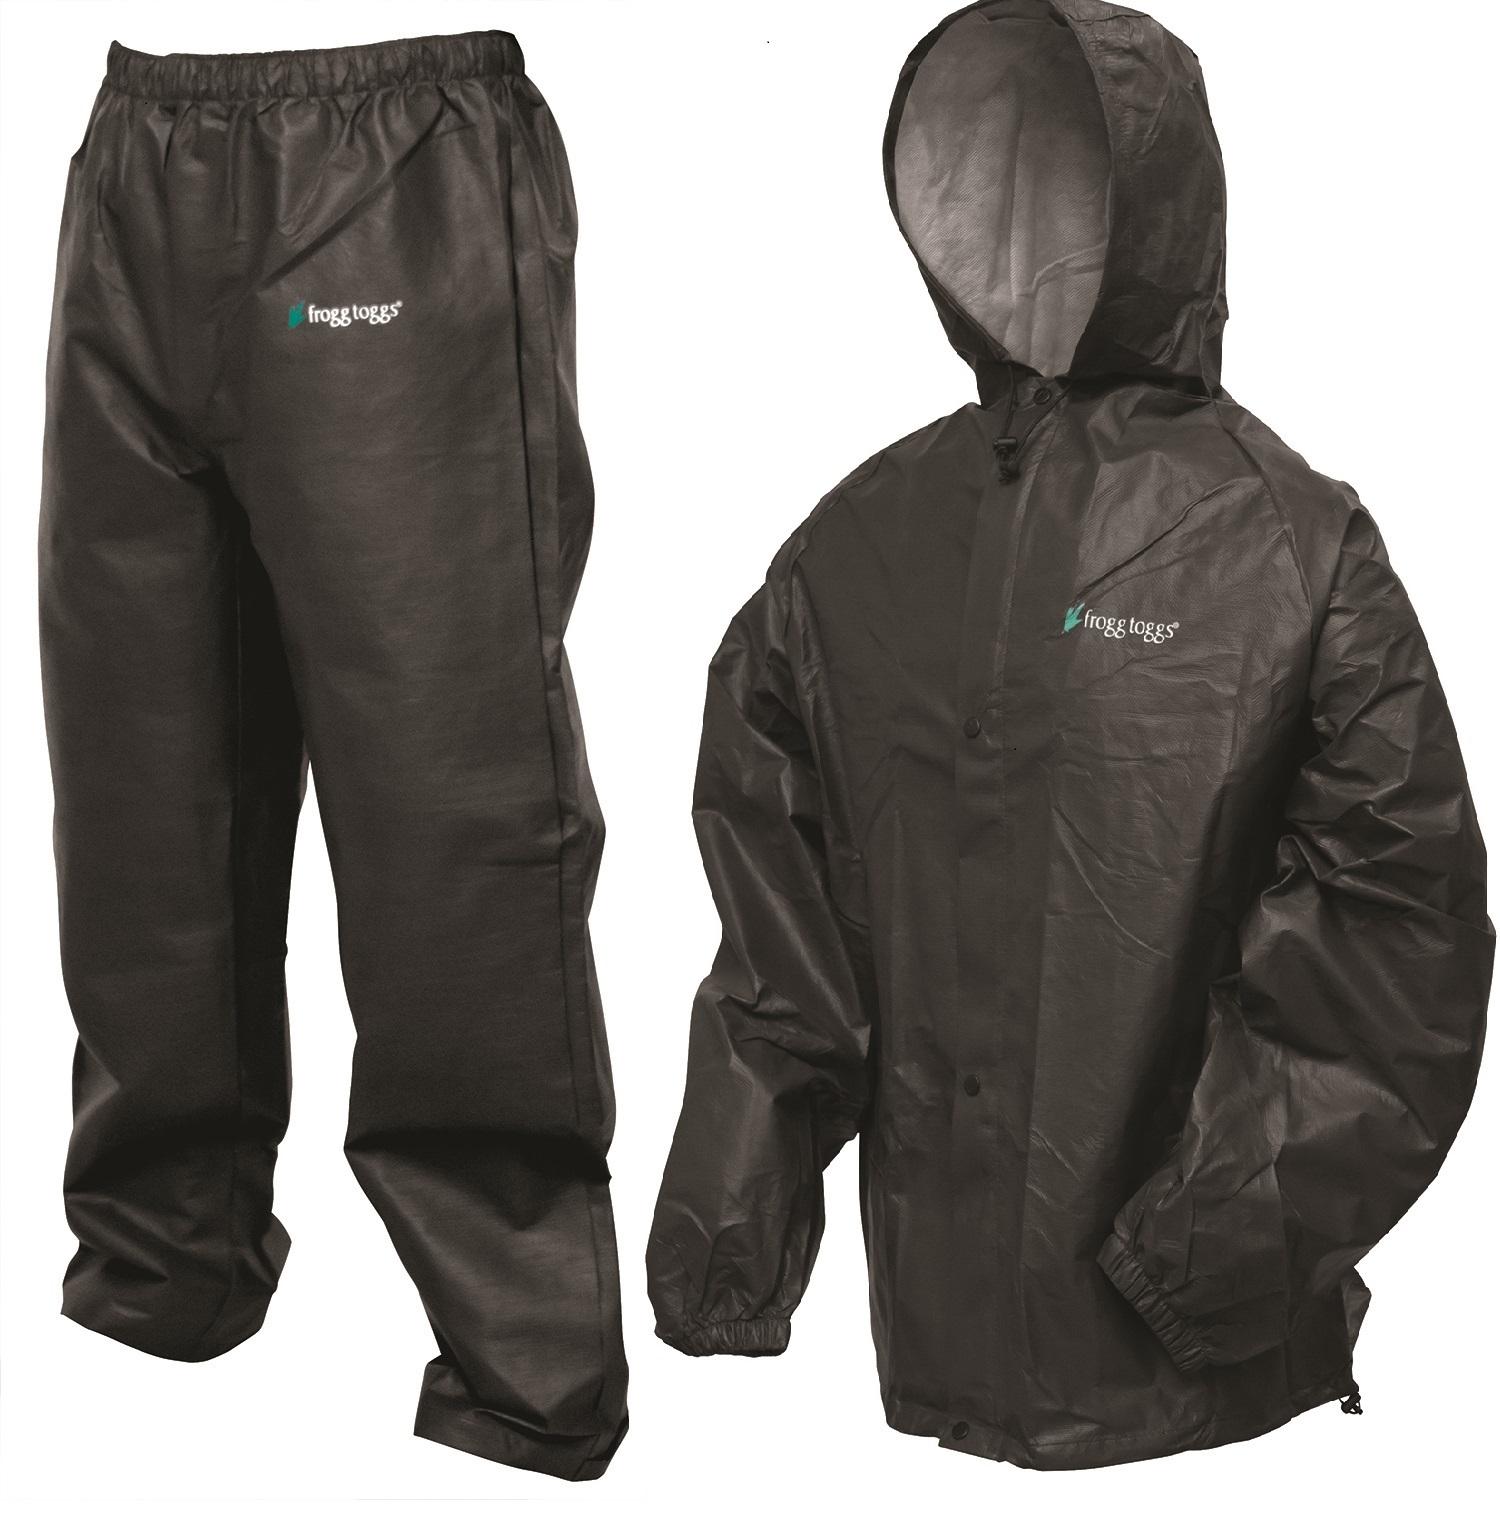 Frogg Toggs Pro Lite Rain Suit Black - X XXL